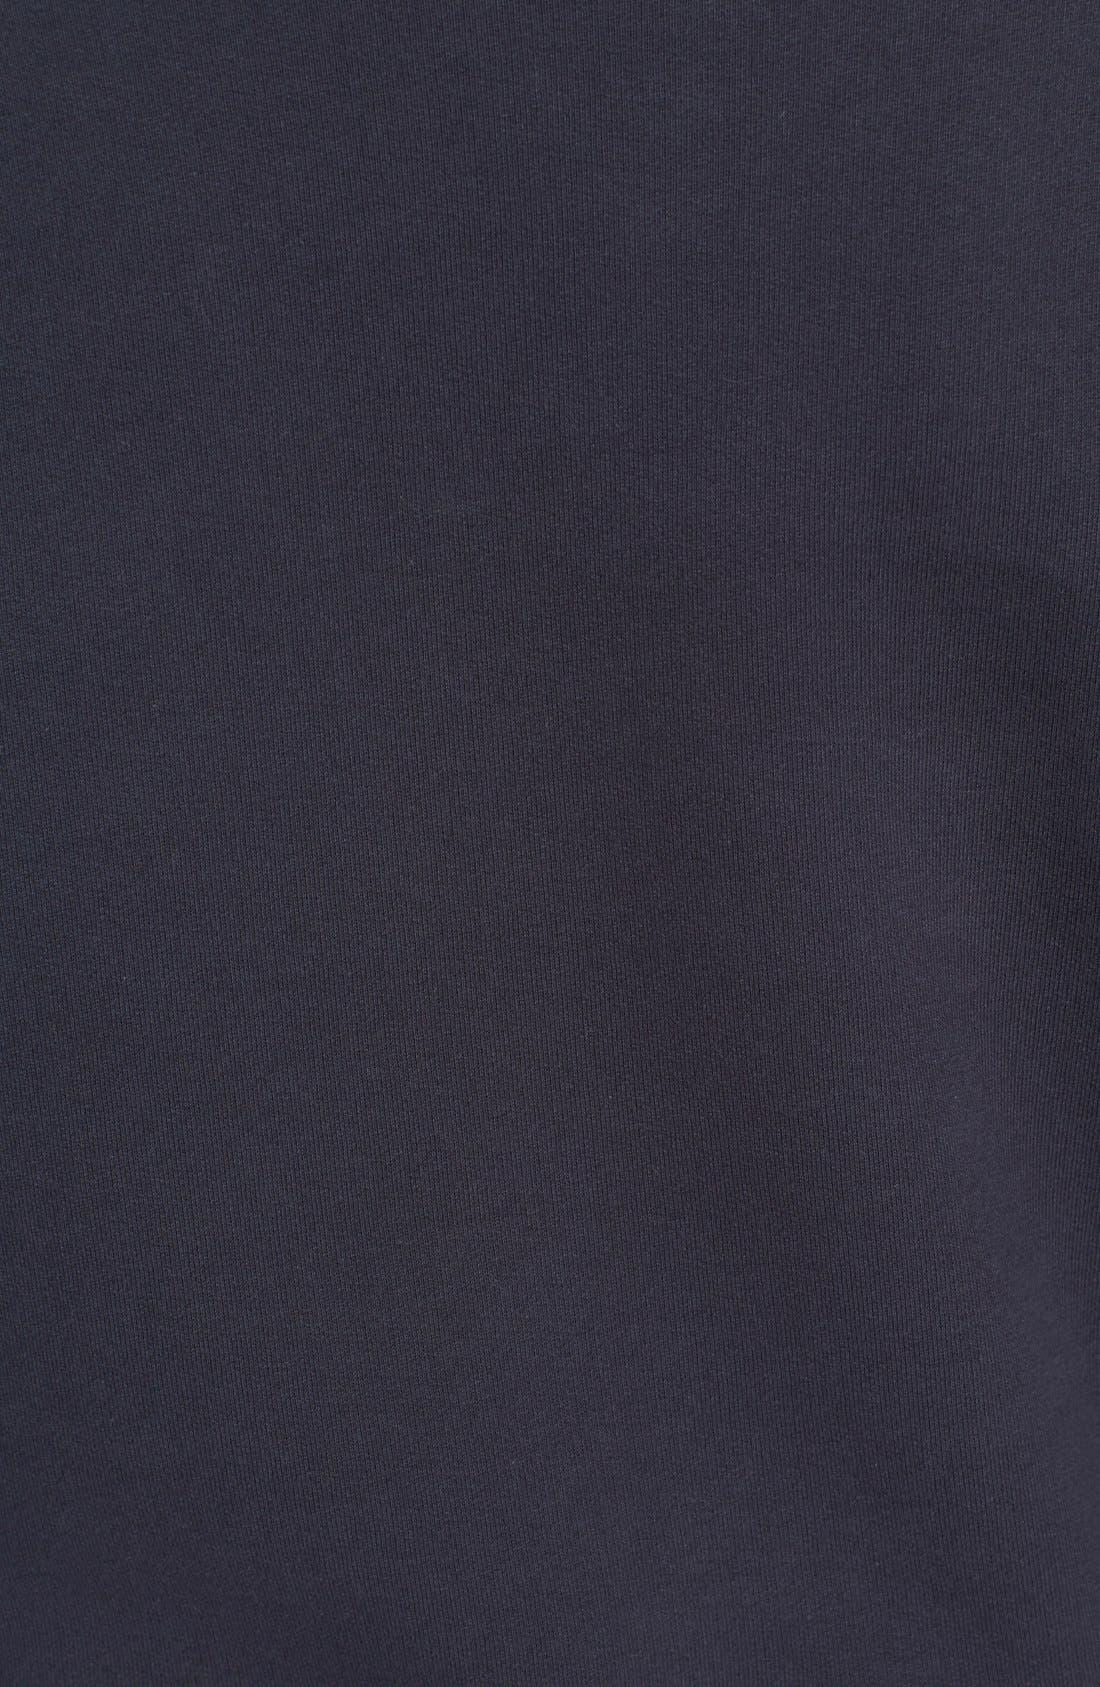 Alternate Image 3  - ACNE Studios 'Bird FL' Crop Sweatshirt